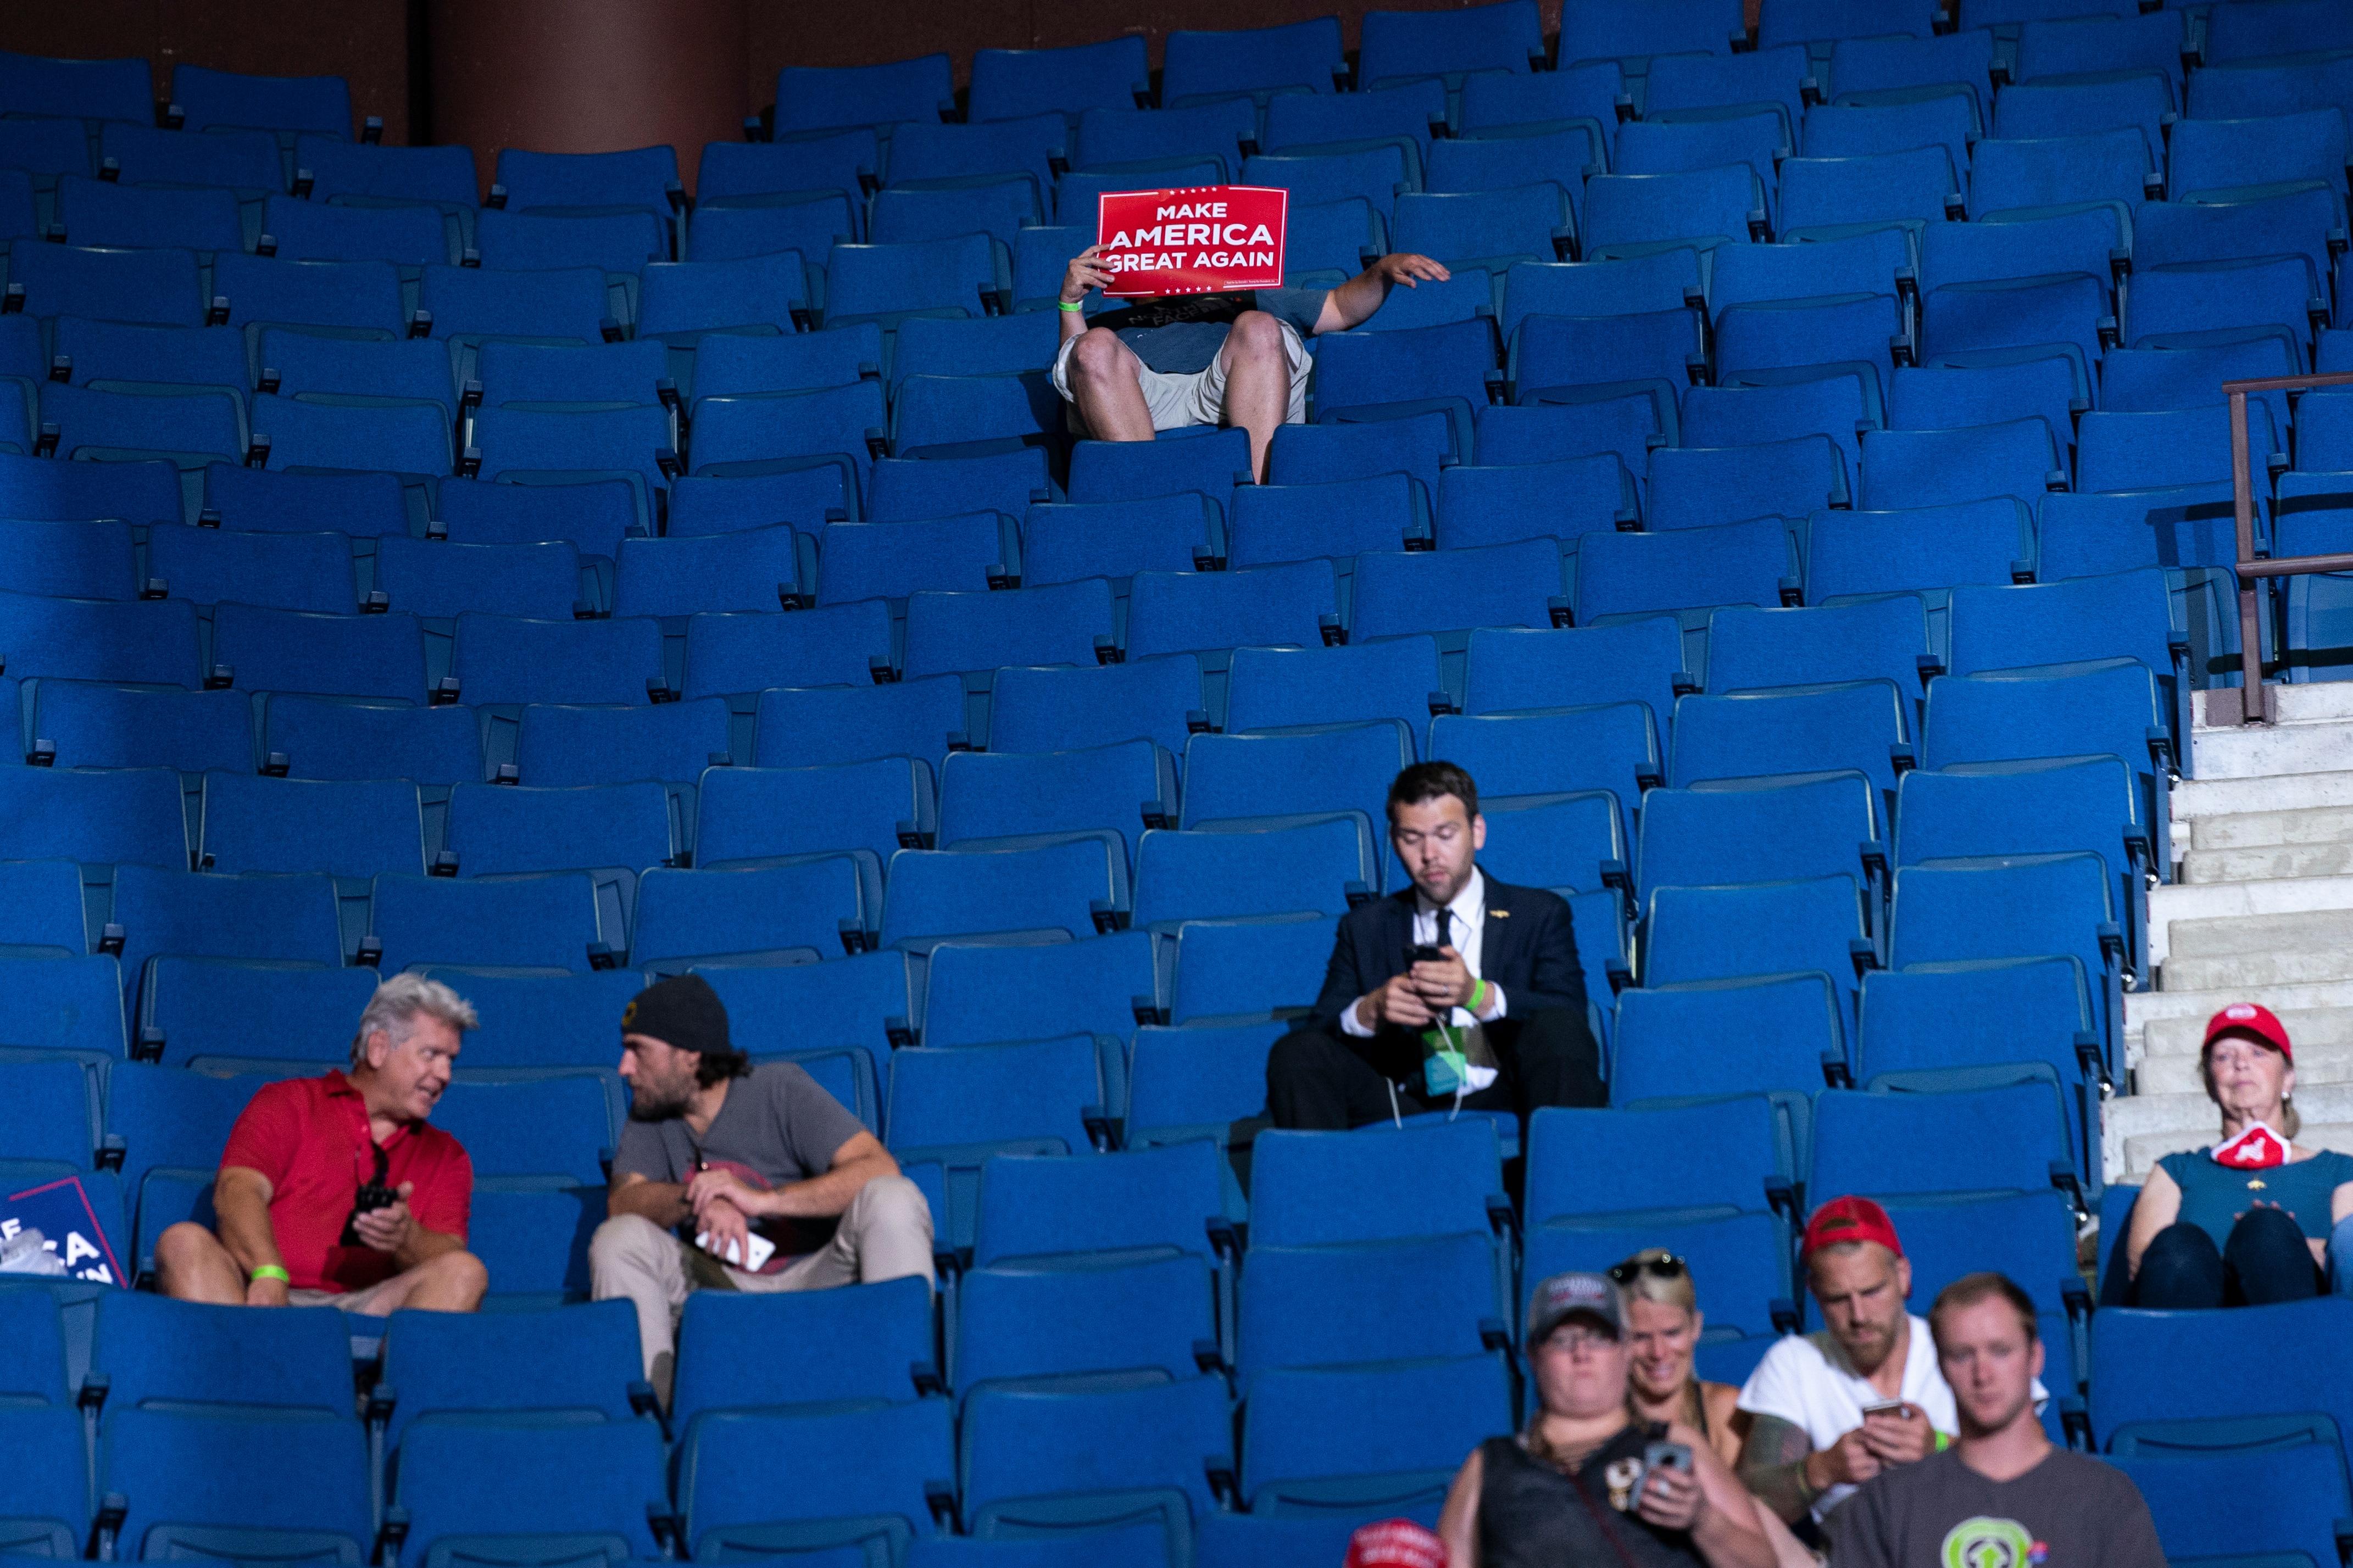 Trump Rally - empty seats